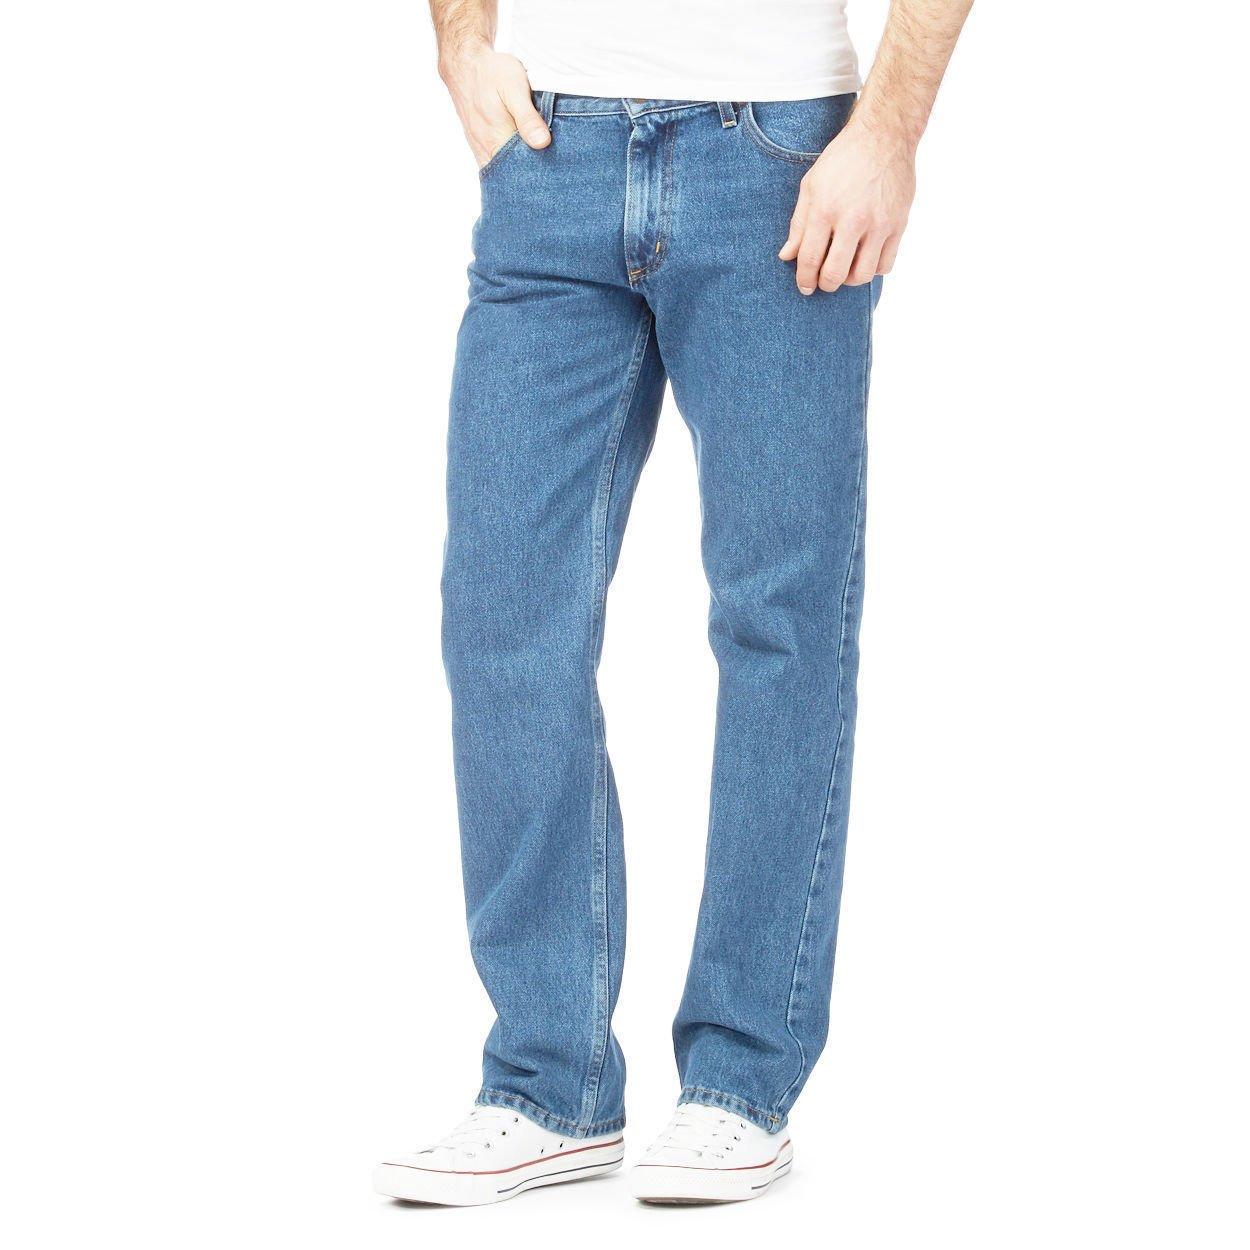 Eshopping Warehouse Mens Denim Jeans Plain Fited Straight Leg Black Blue Denim Jeans All Waist Sizes